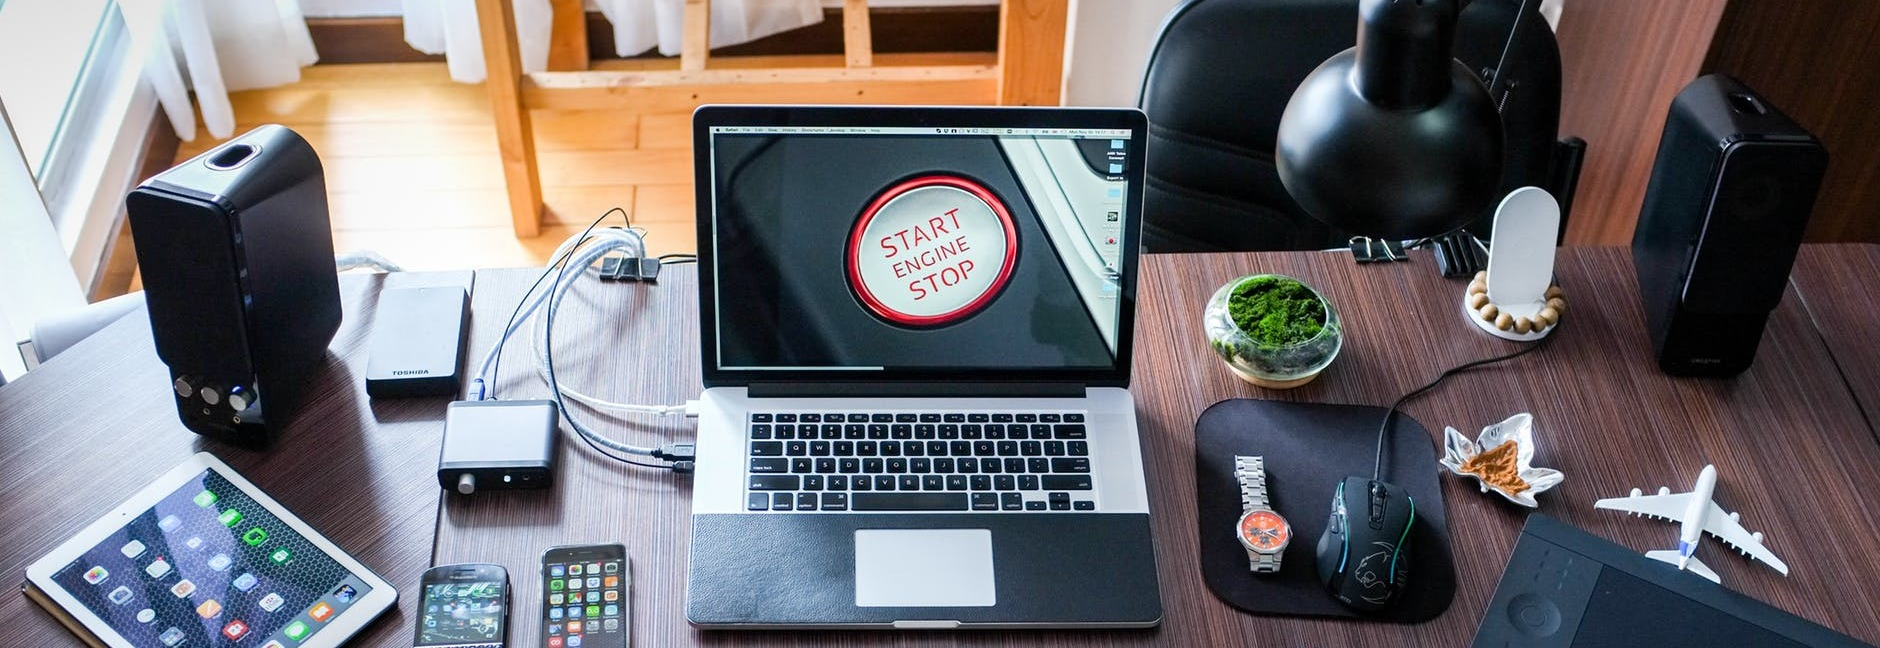 Cara mengganti Password Wifi First Media image